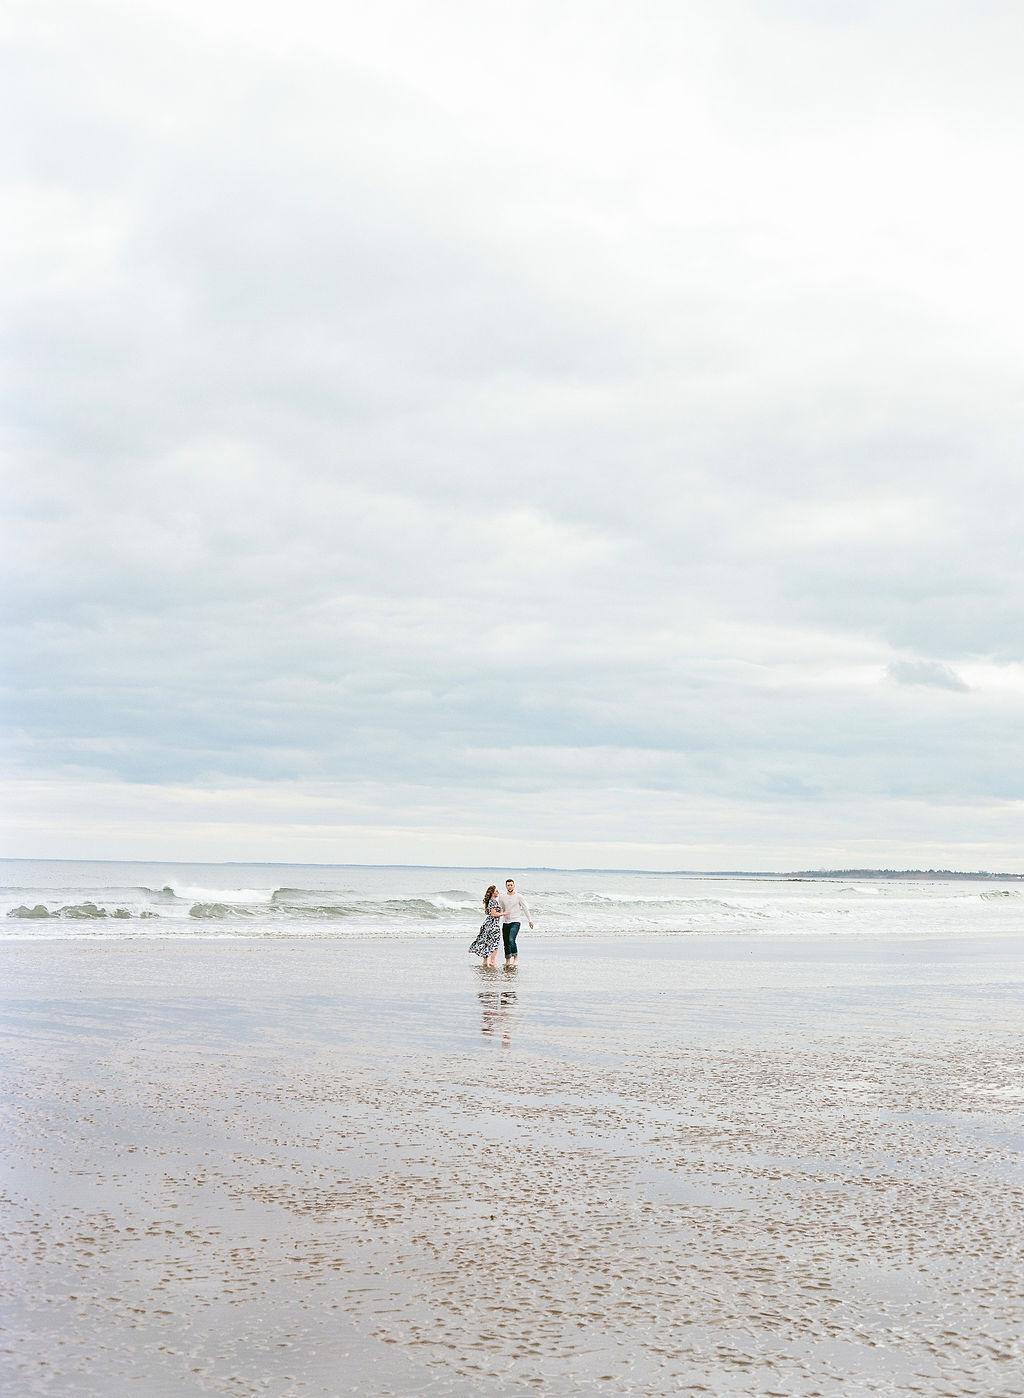 JacquelineAnnePhotography-AkaylaandAndrew-LawrencetownBeach-64.jpg